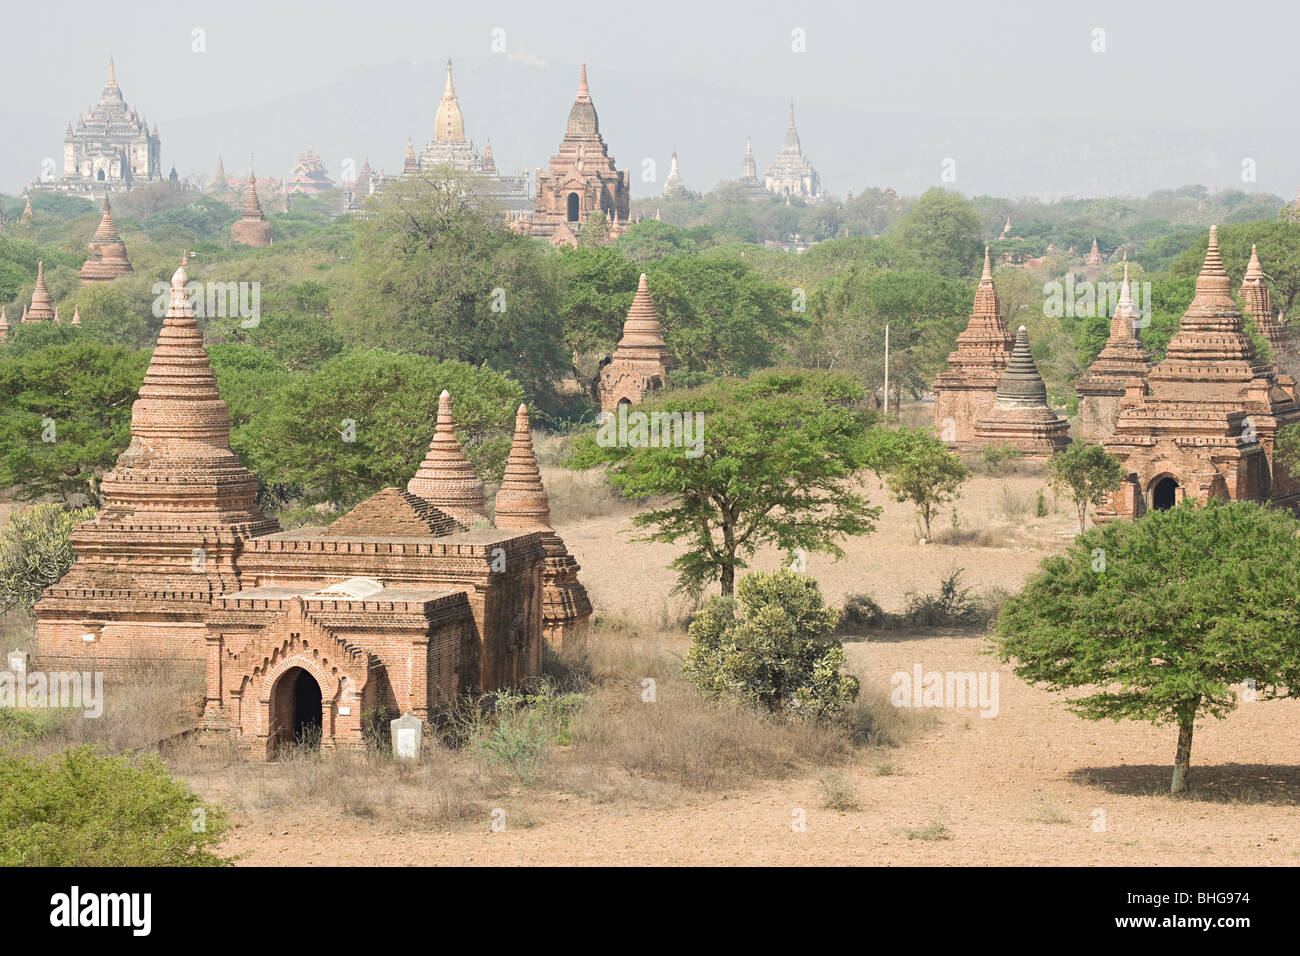 Ancient city of bagan in burma Stock Photo